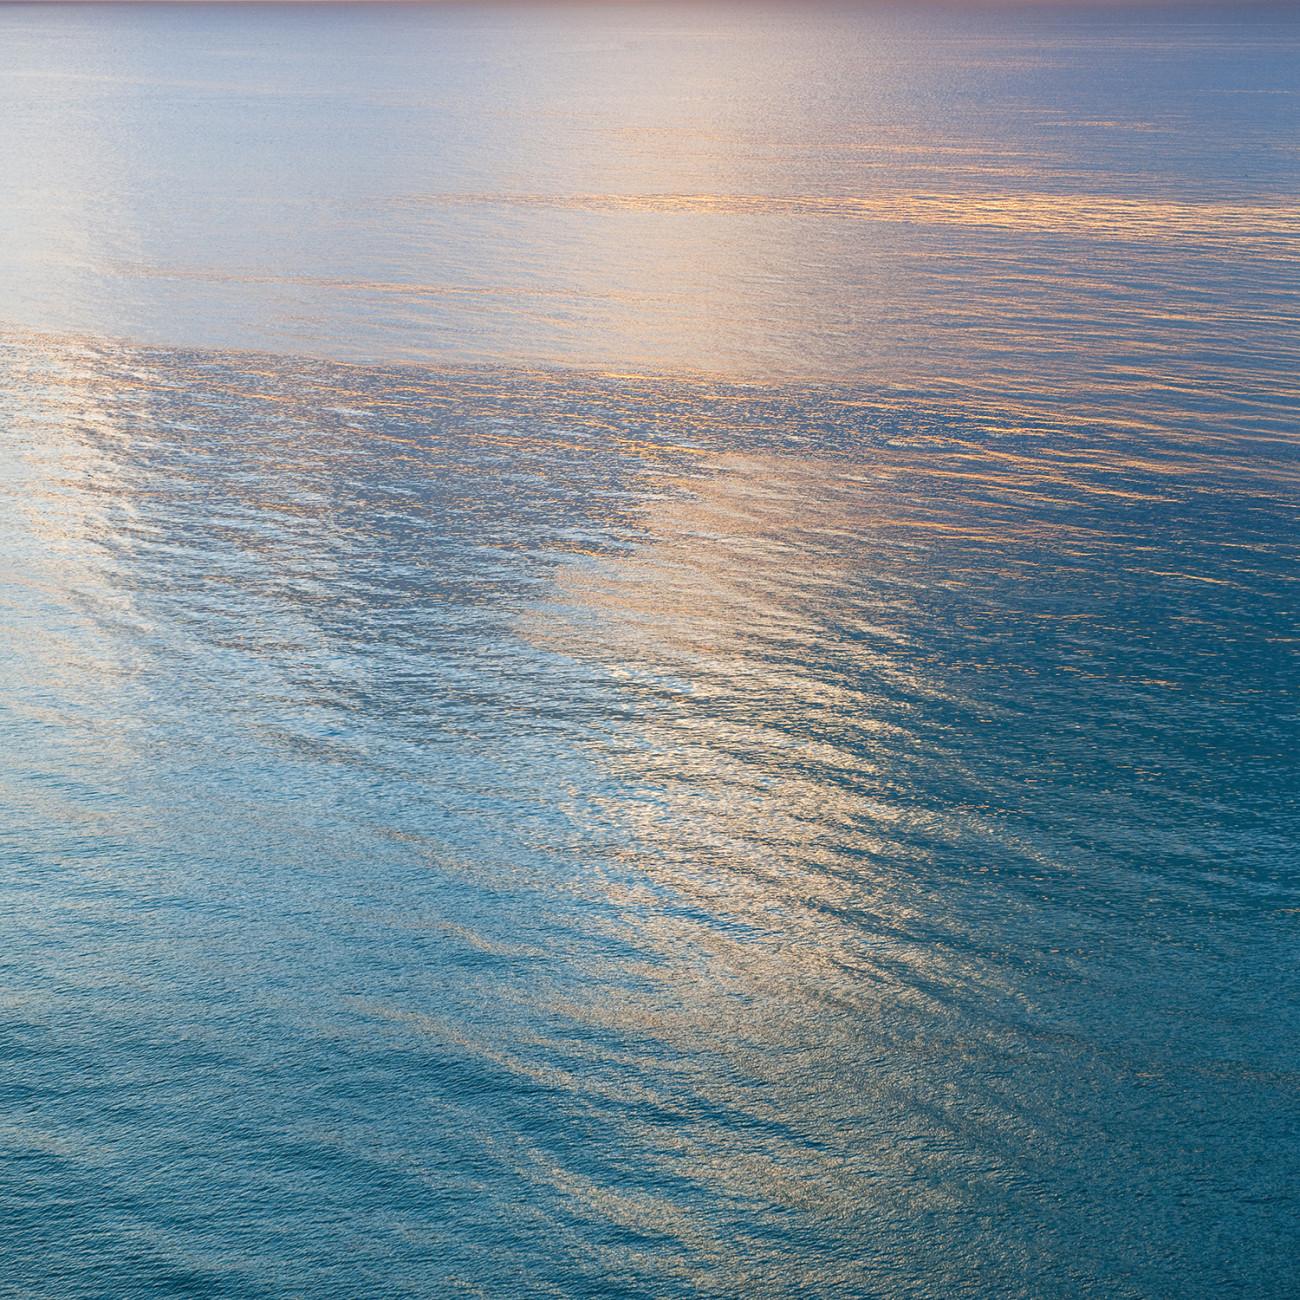 Morning reflections, Atlantic Ocean, 2009